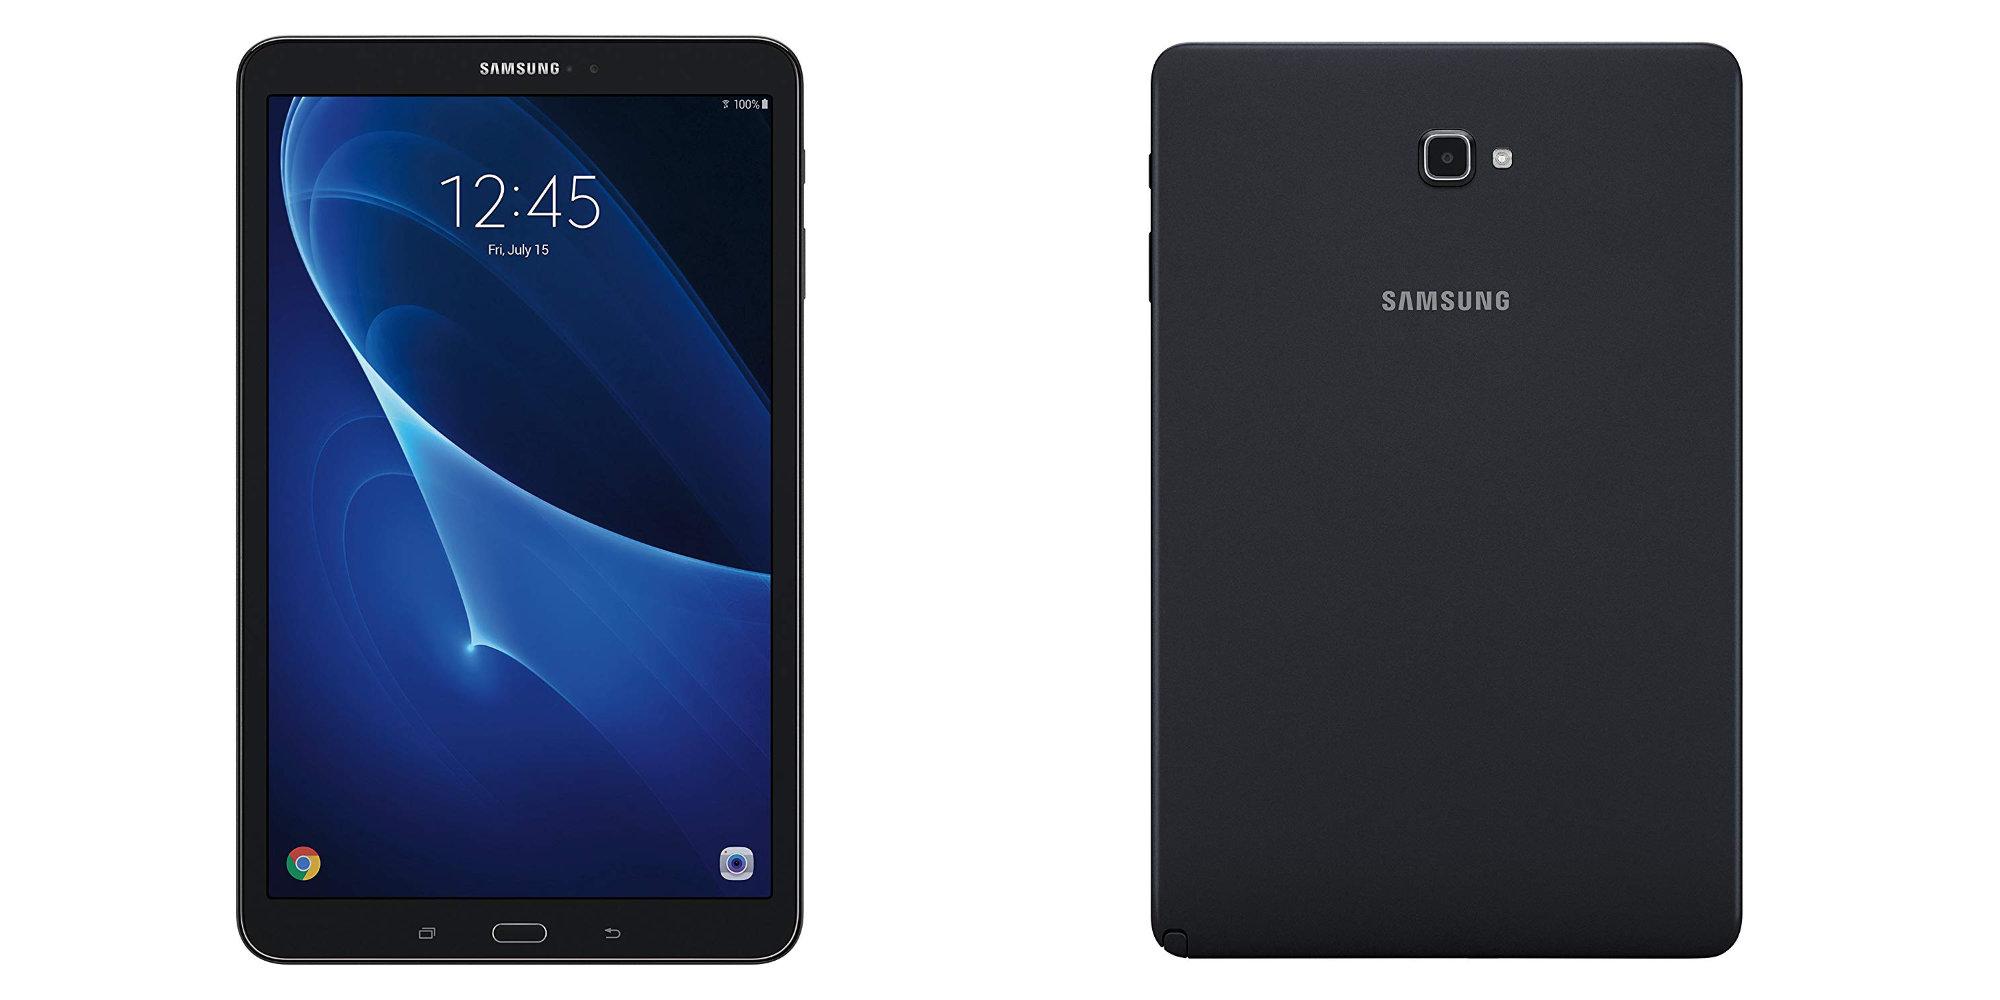 Samsung's 10.1-inch Galaxy Tab A has 13-hour battery life: $179 at Amazon (Reg. $279)